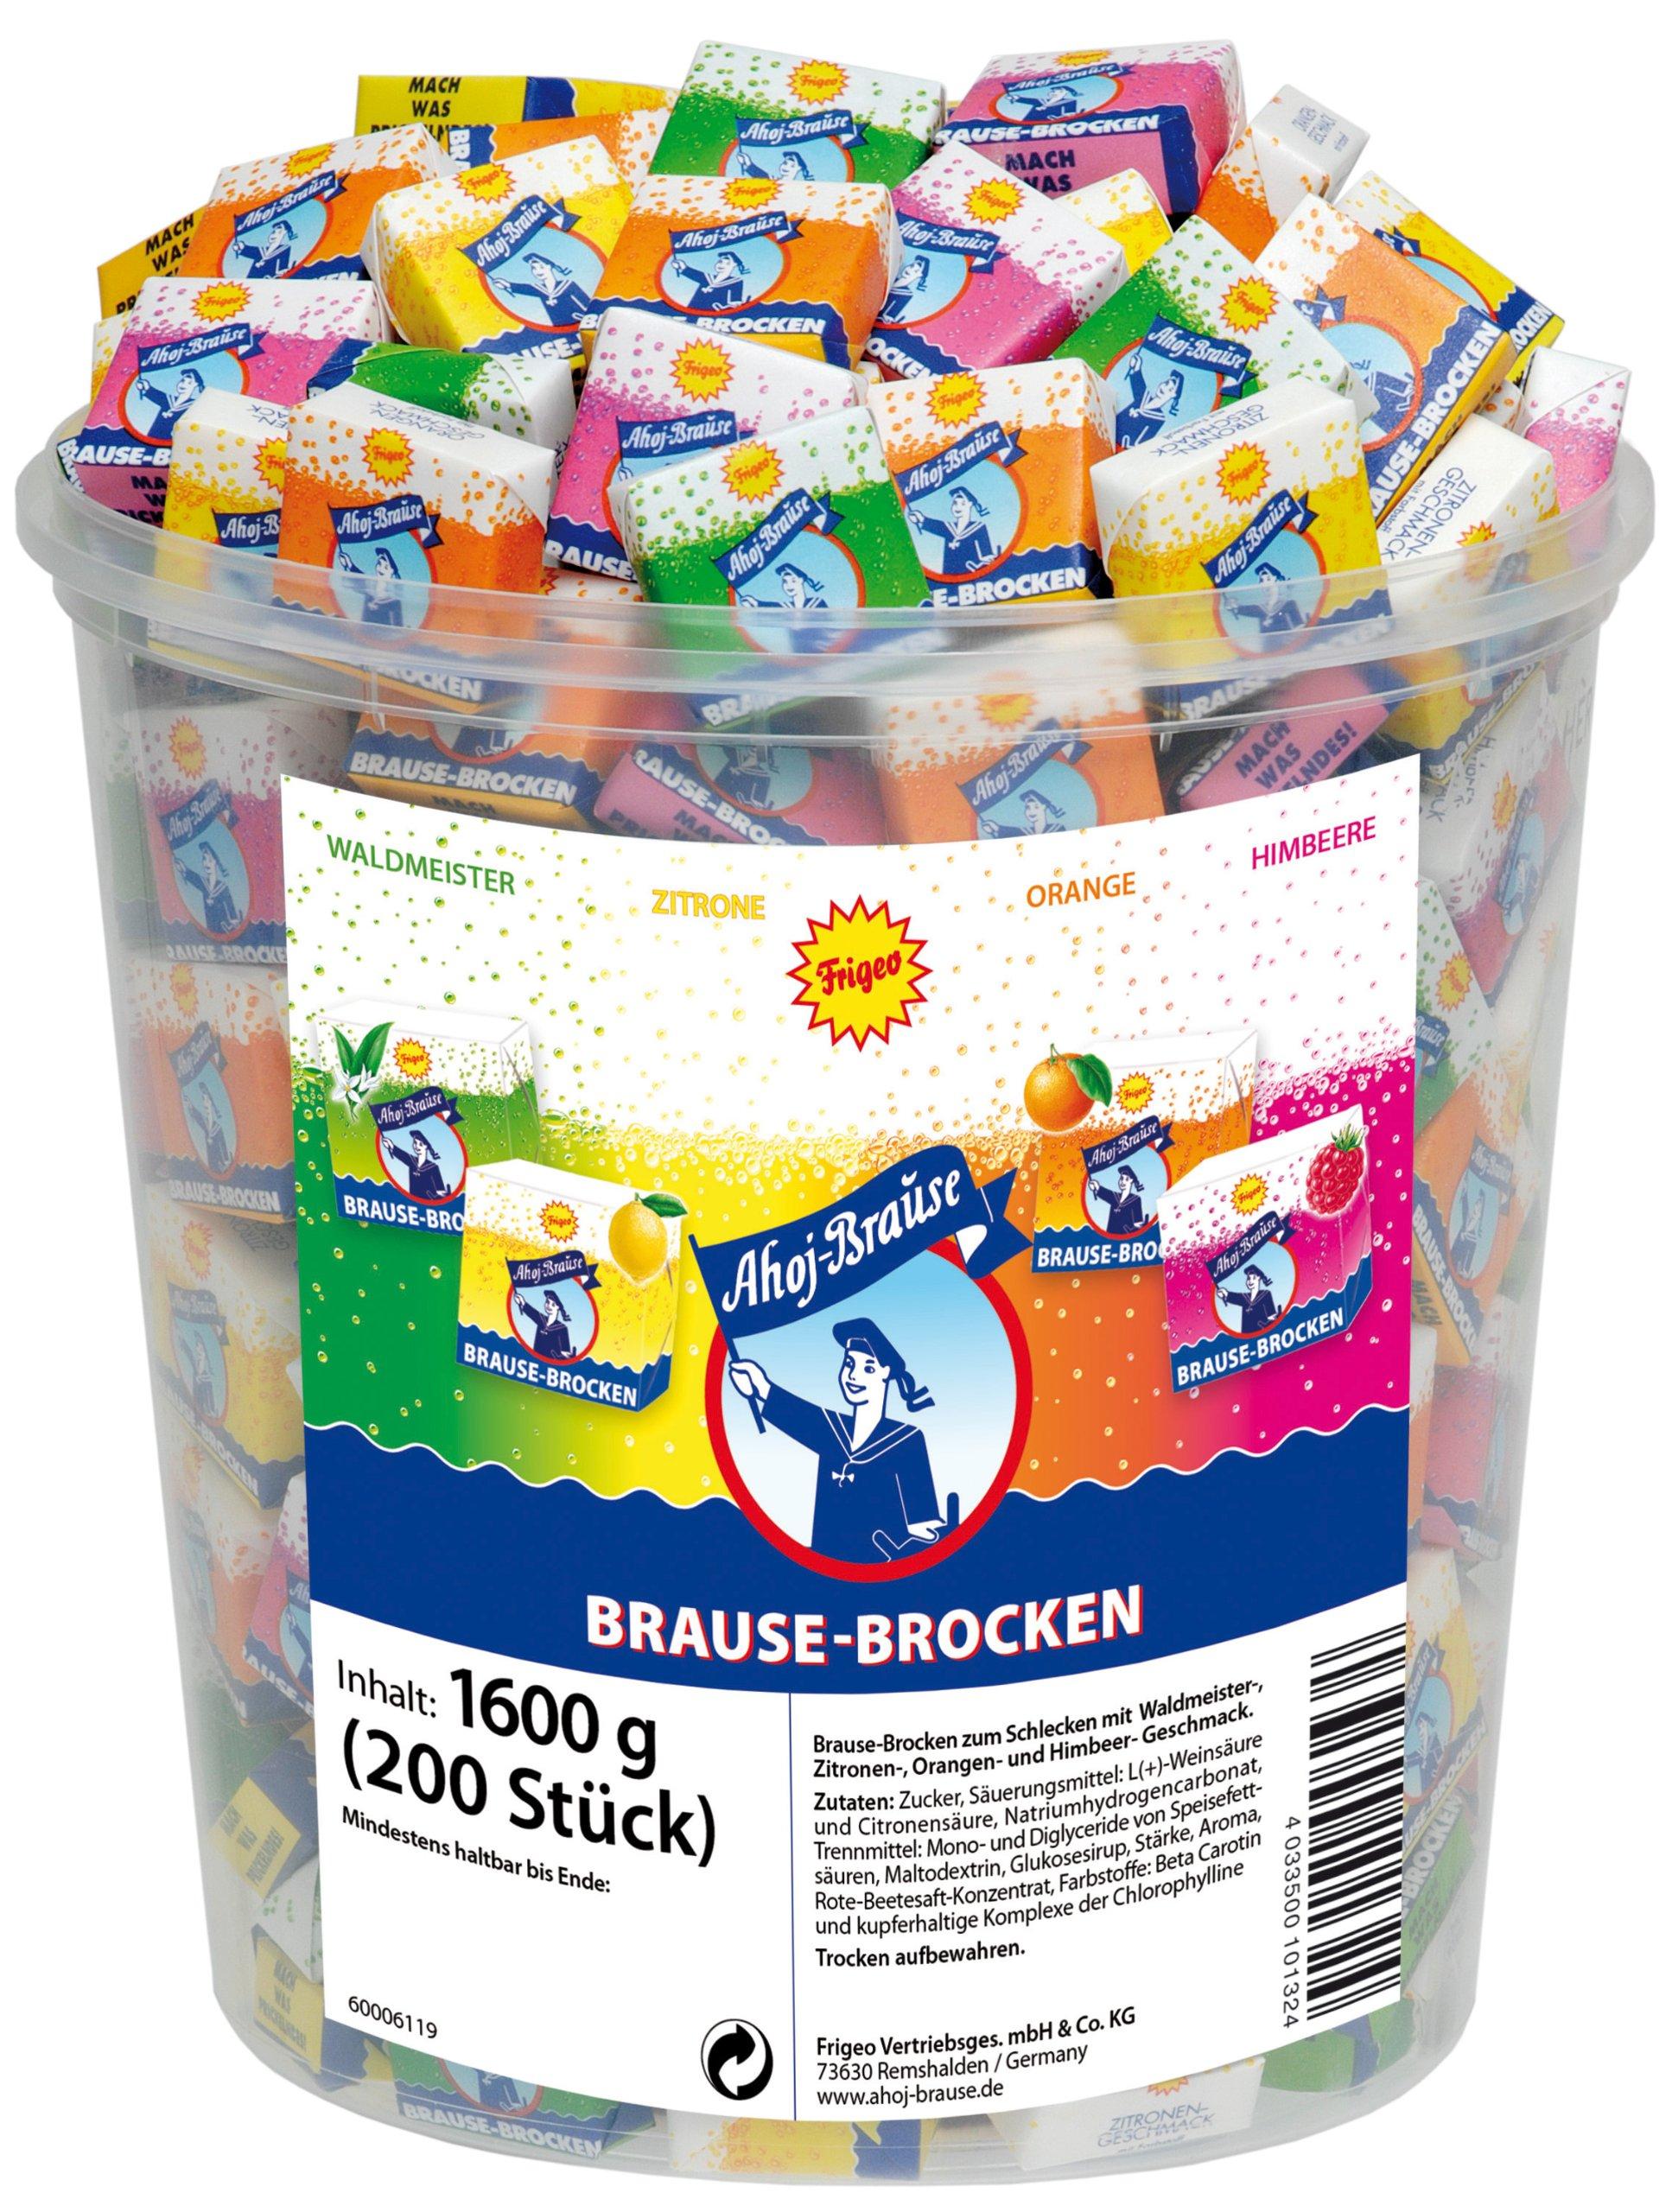 Frigeo Ahoj Brause Brocken fizzy candy, 200pcs by Frigeo